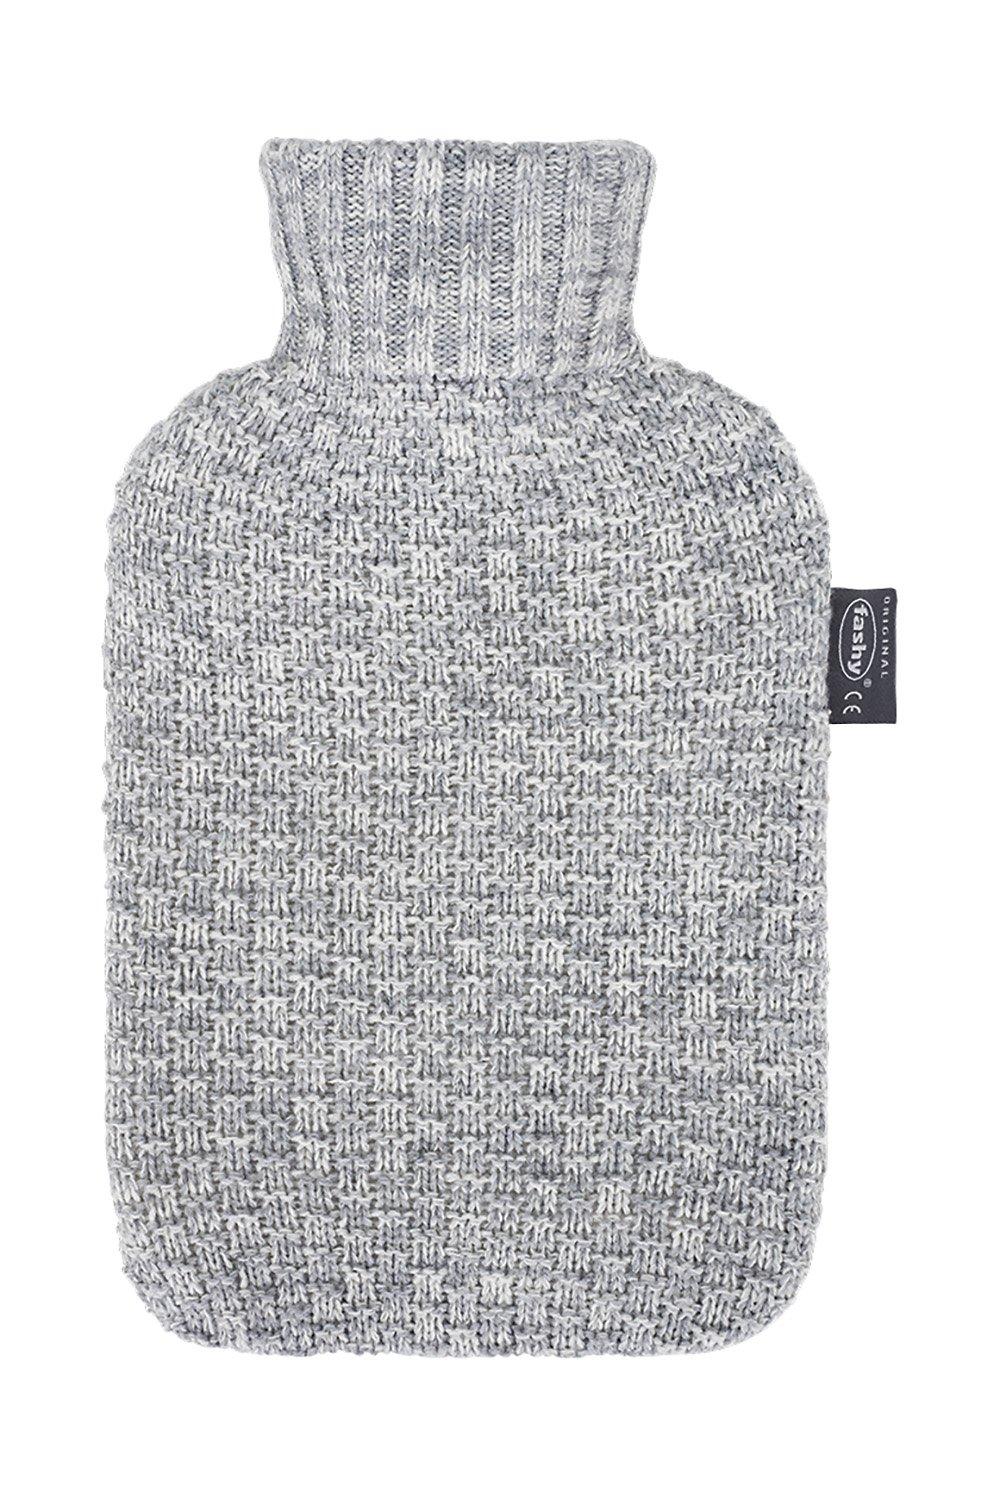 Fashy GmbH Bouillotte avec housse en tricot, 2litre 67218